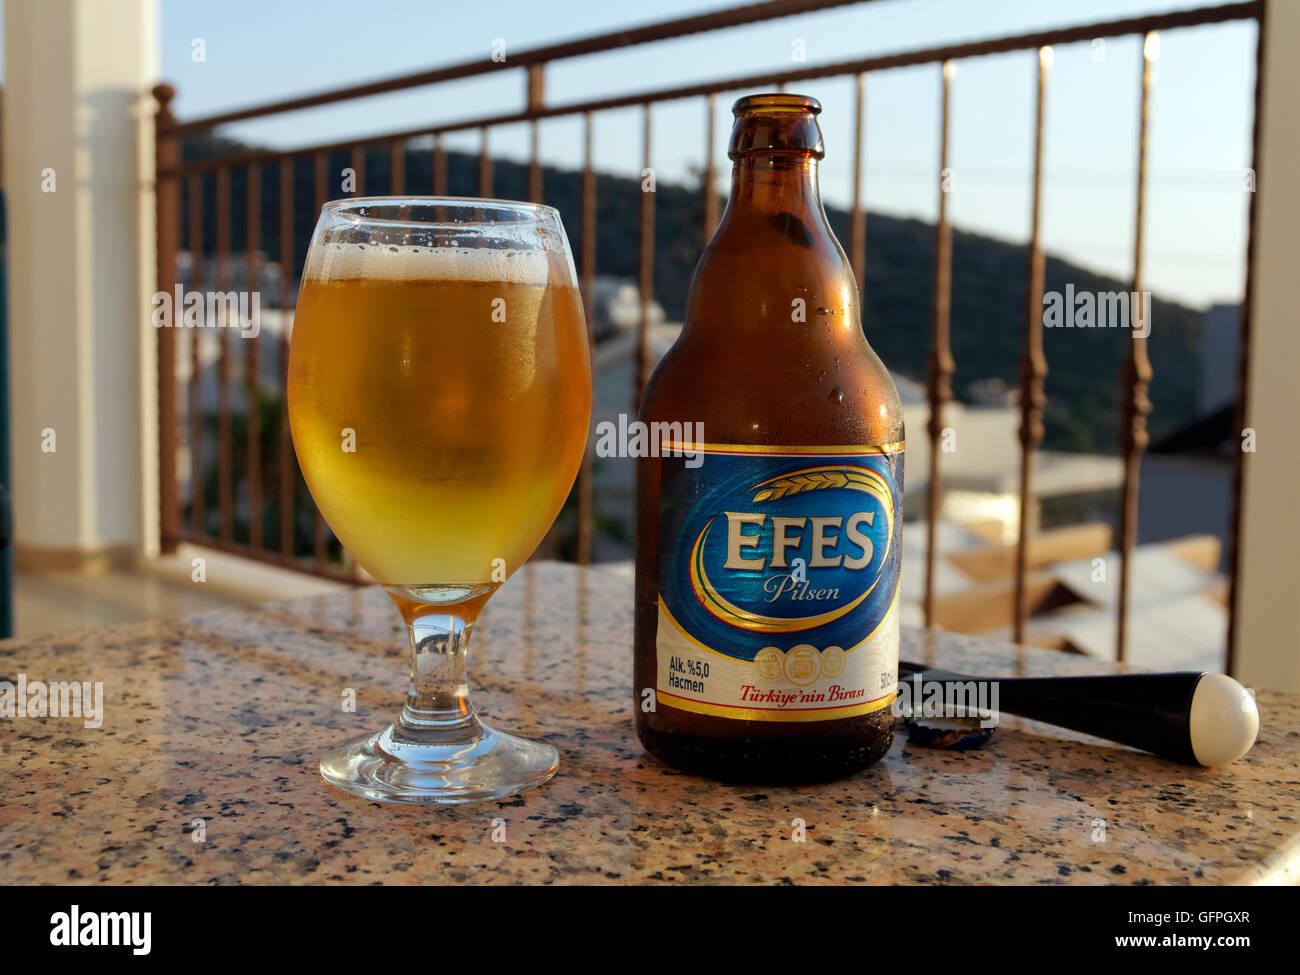 Bottle and glass of Efes Pilsen beer, Turkey. Stock Photo